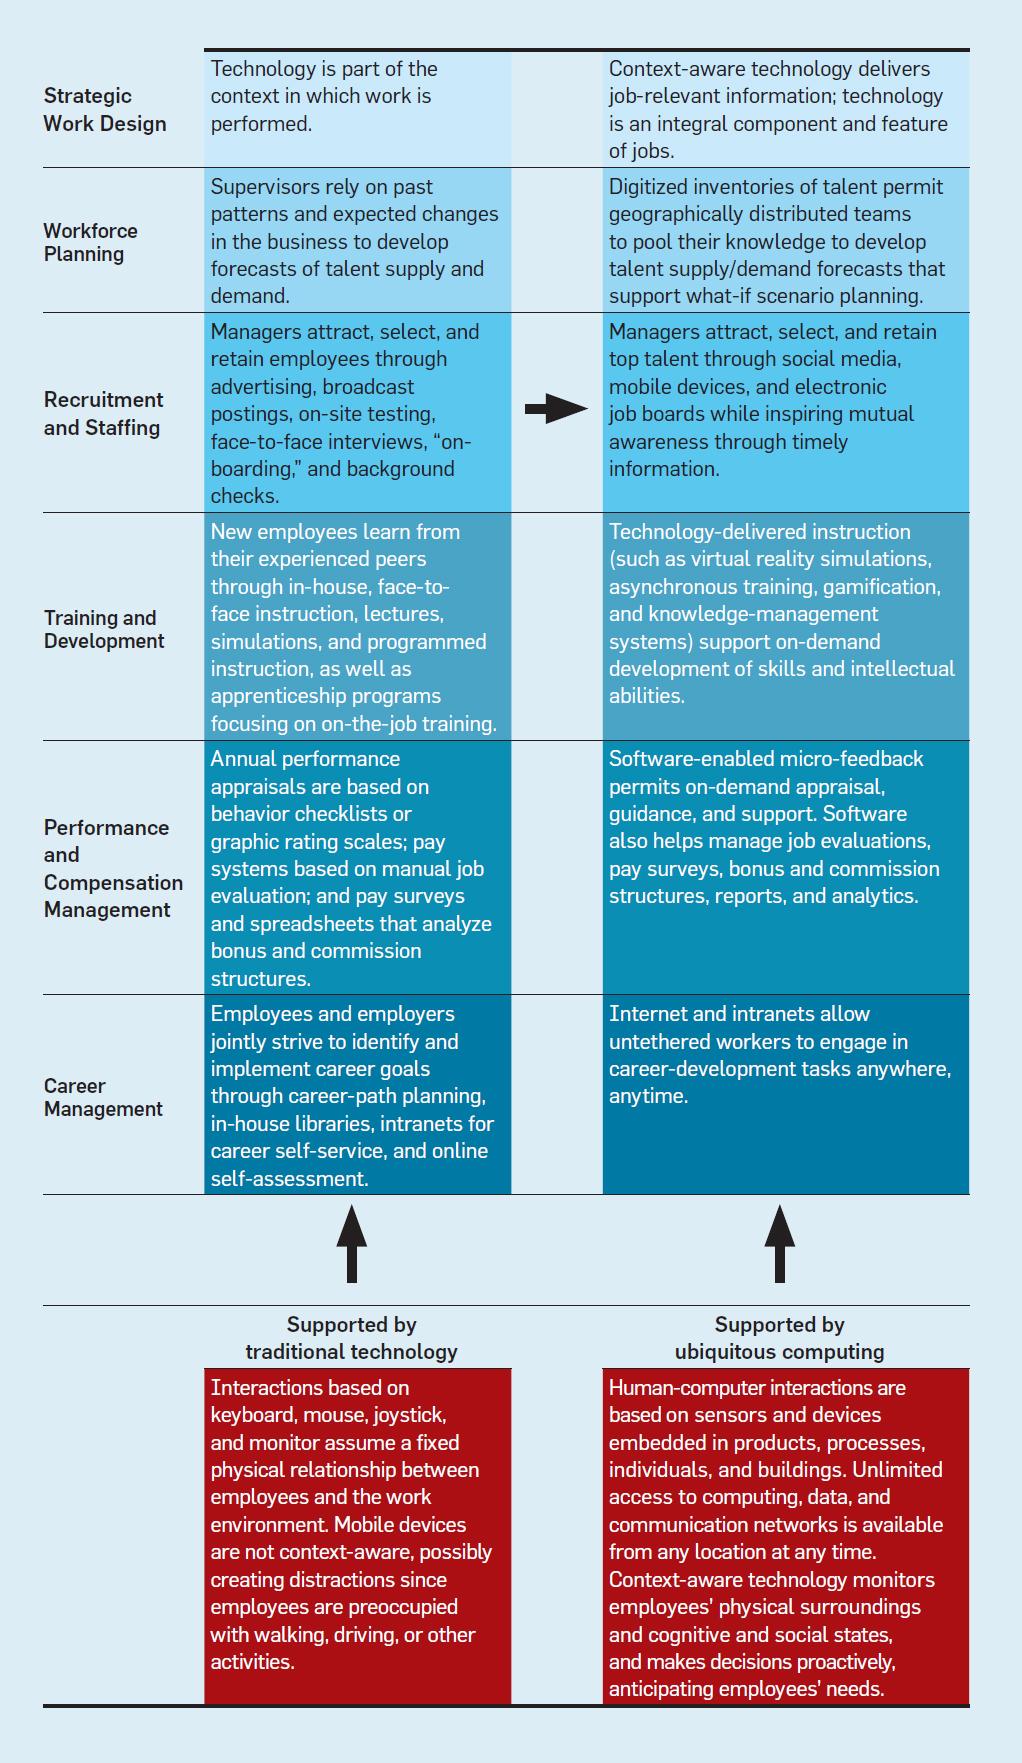 retaining staff through talent management